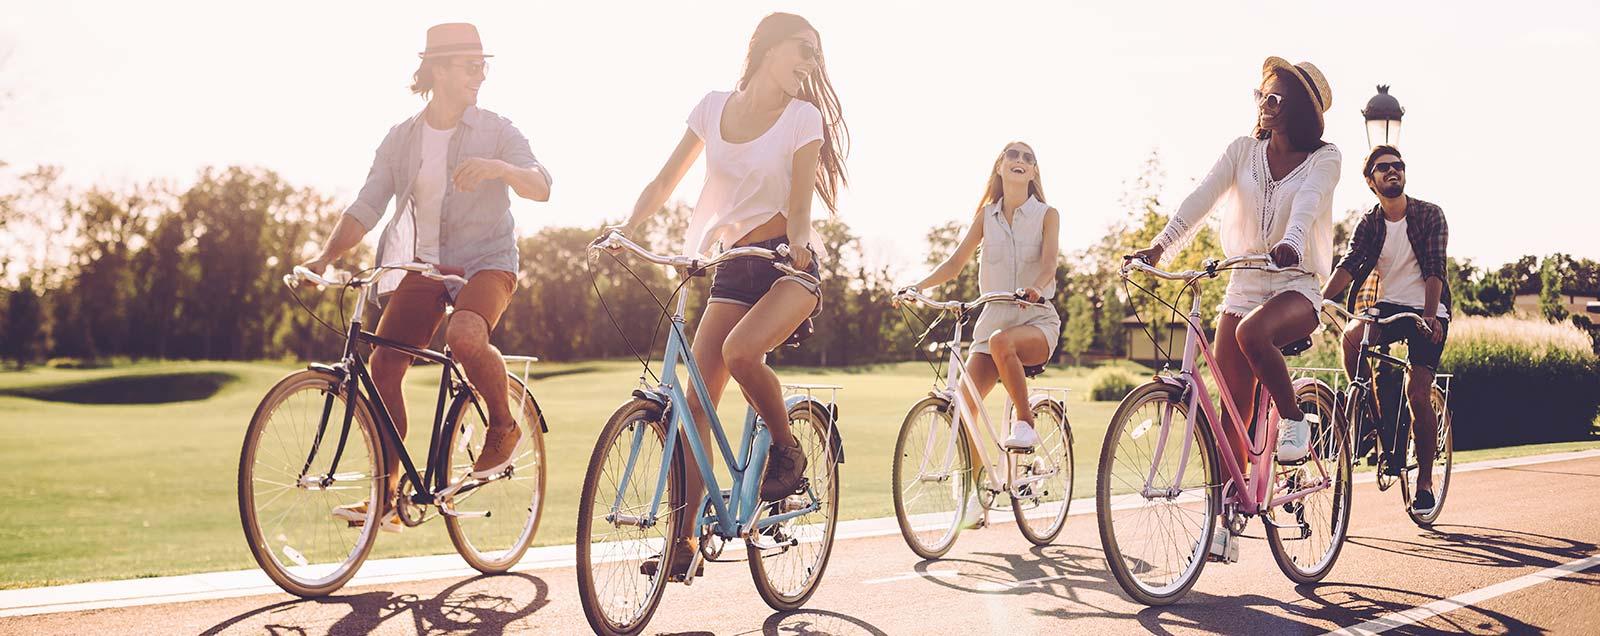 Vacanze bike